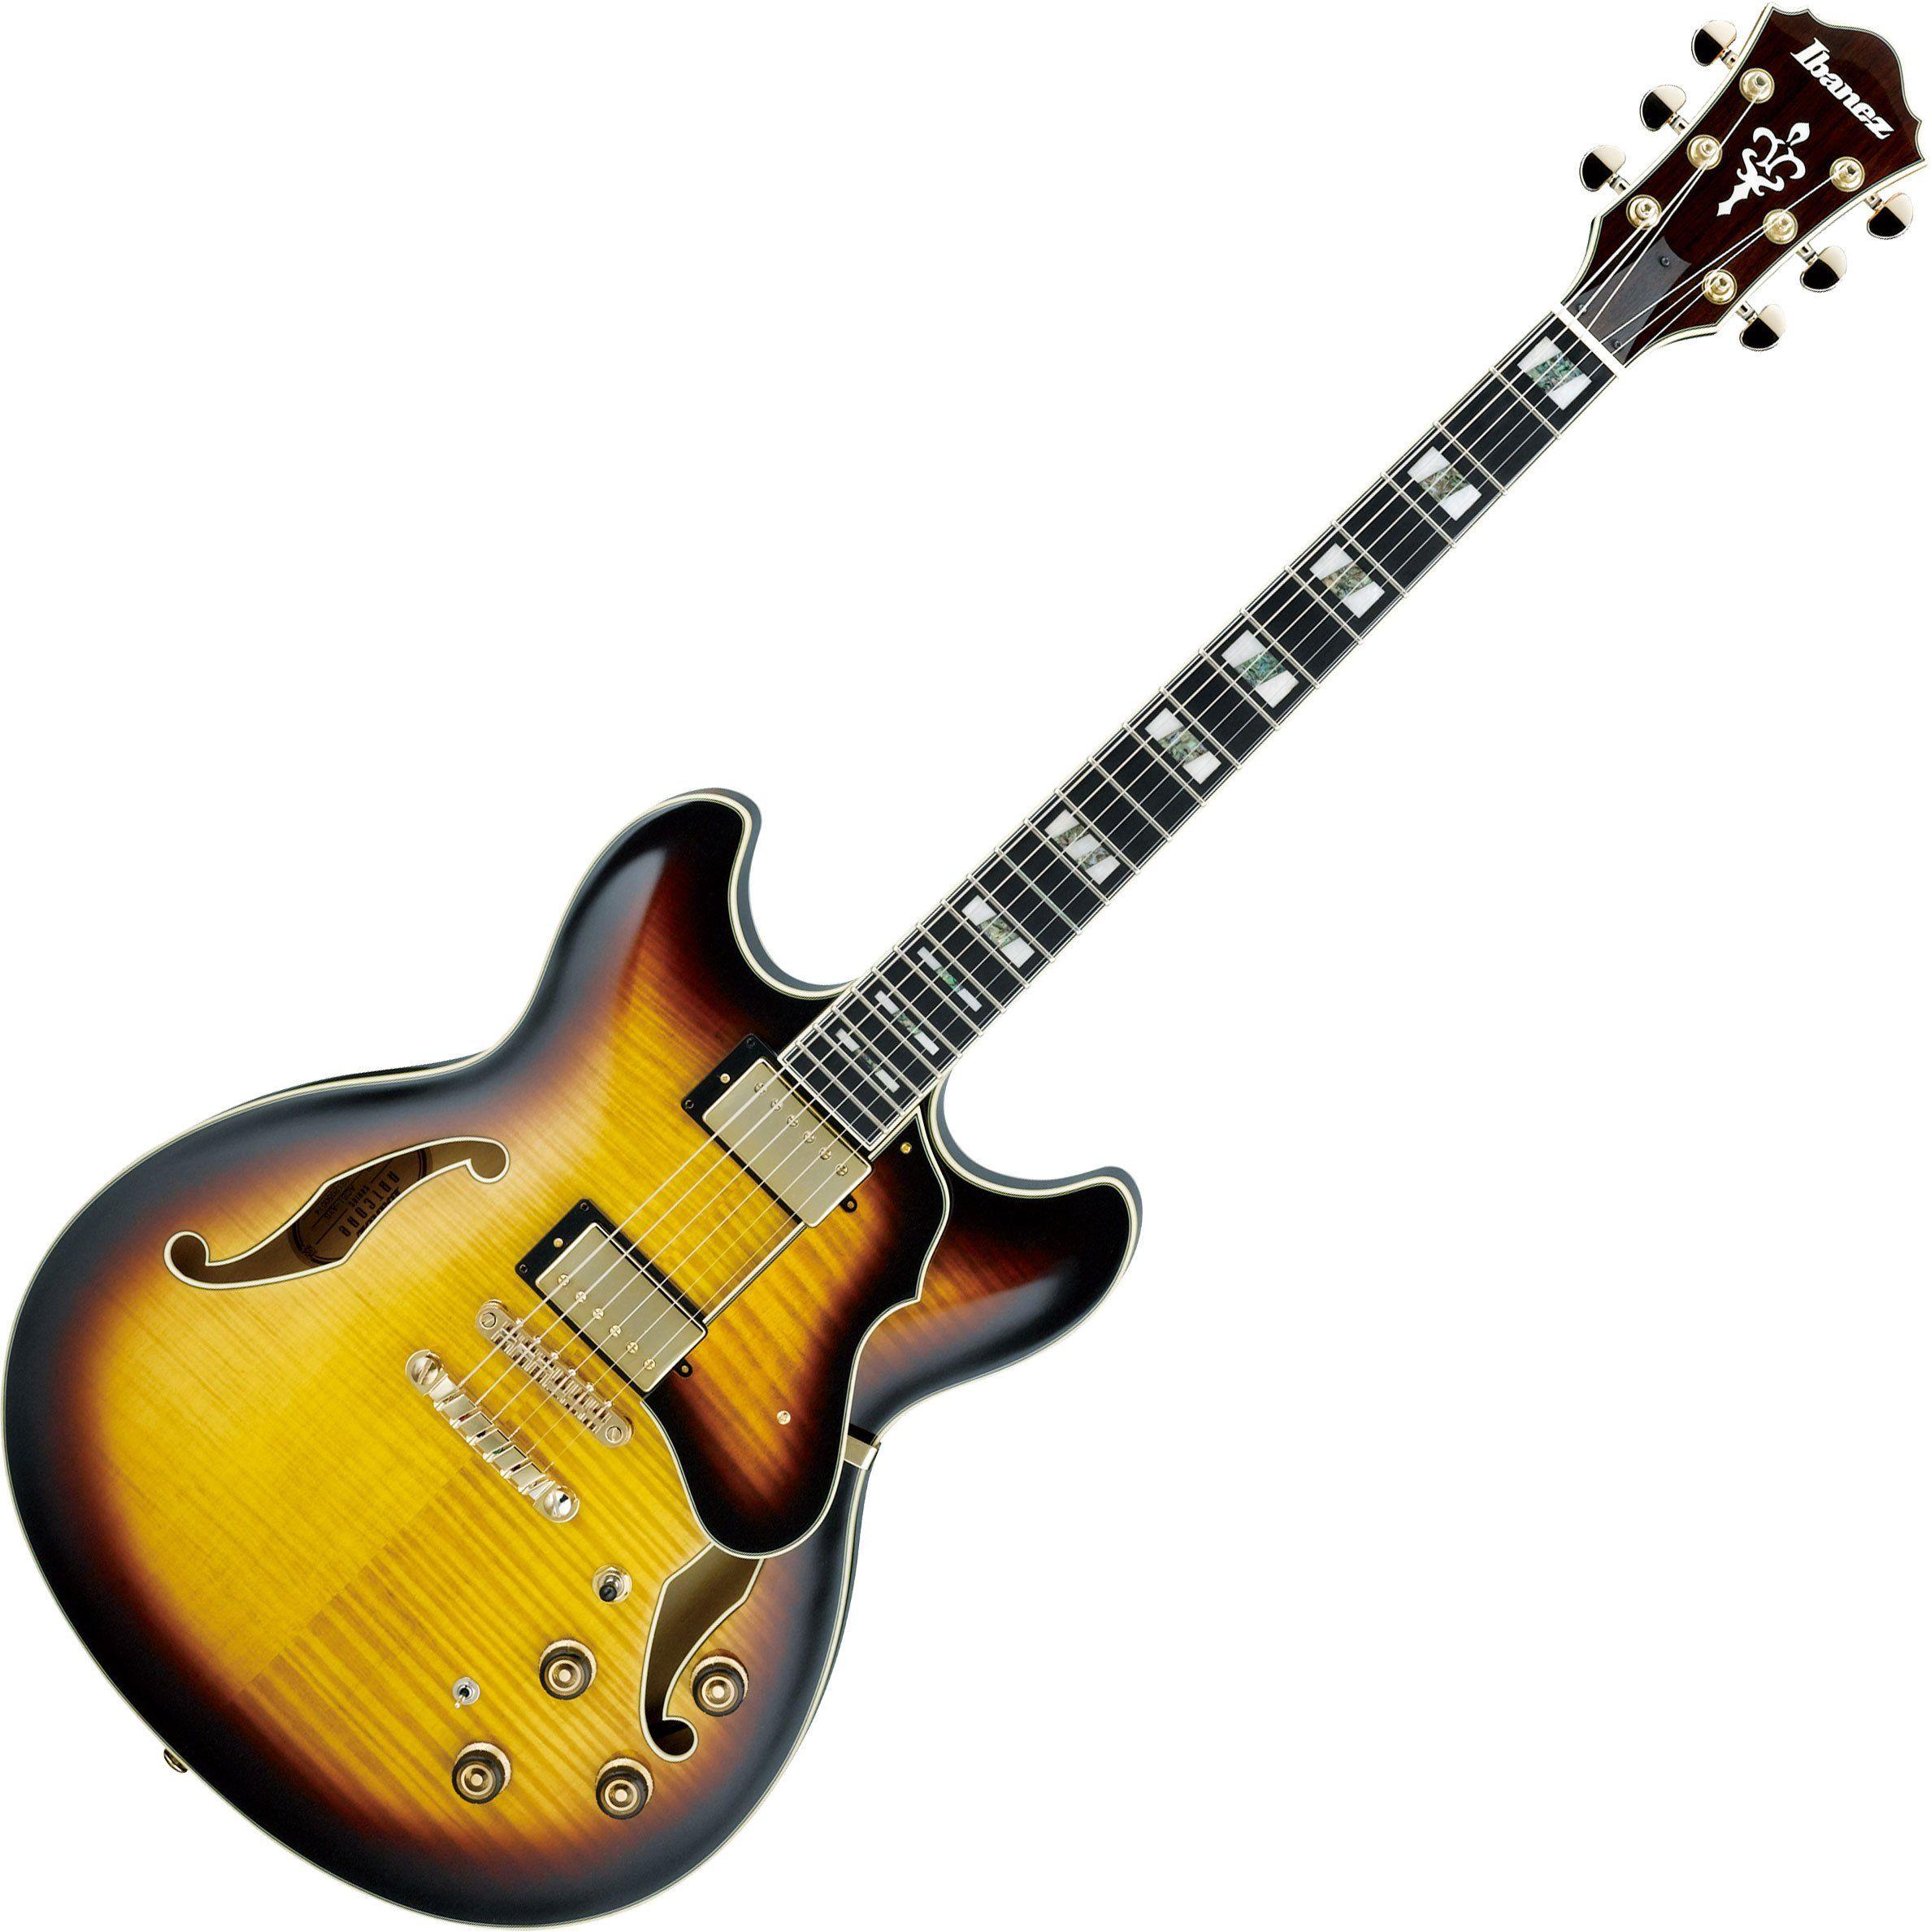 ibanez artstar as153 hollow body electric guitar antique yellow sunbur. Black Bedroom Furniture Sets. Home Design Ideas